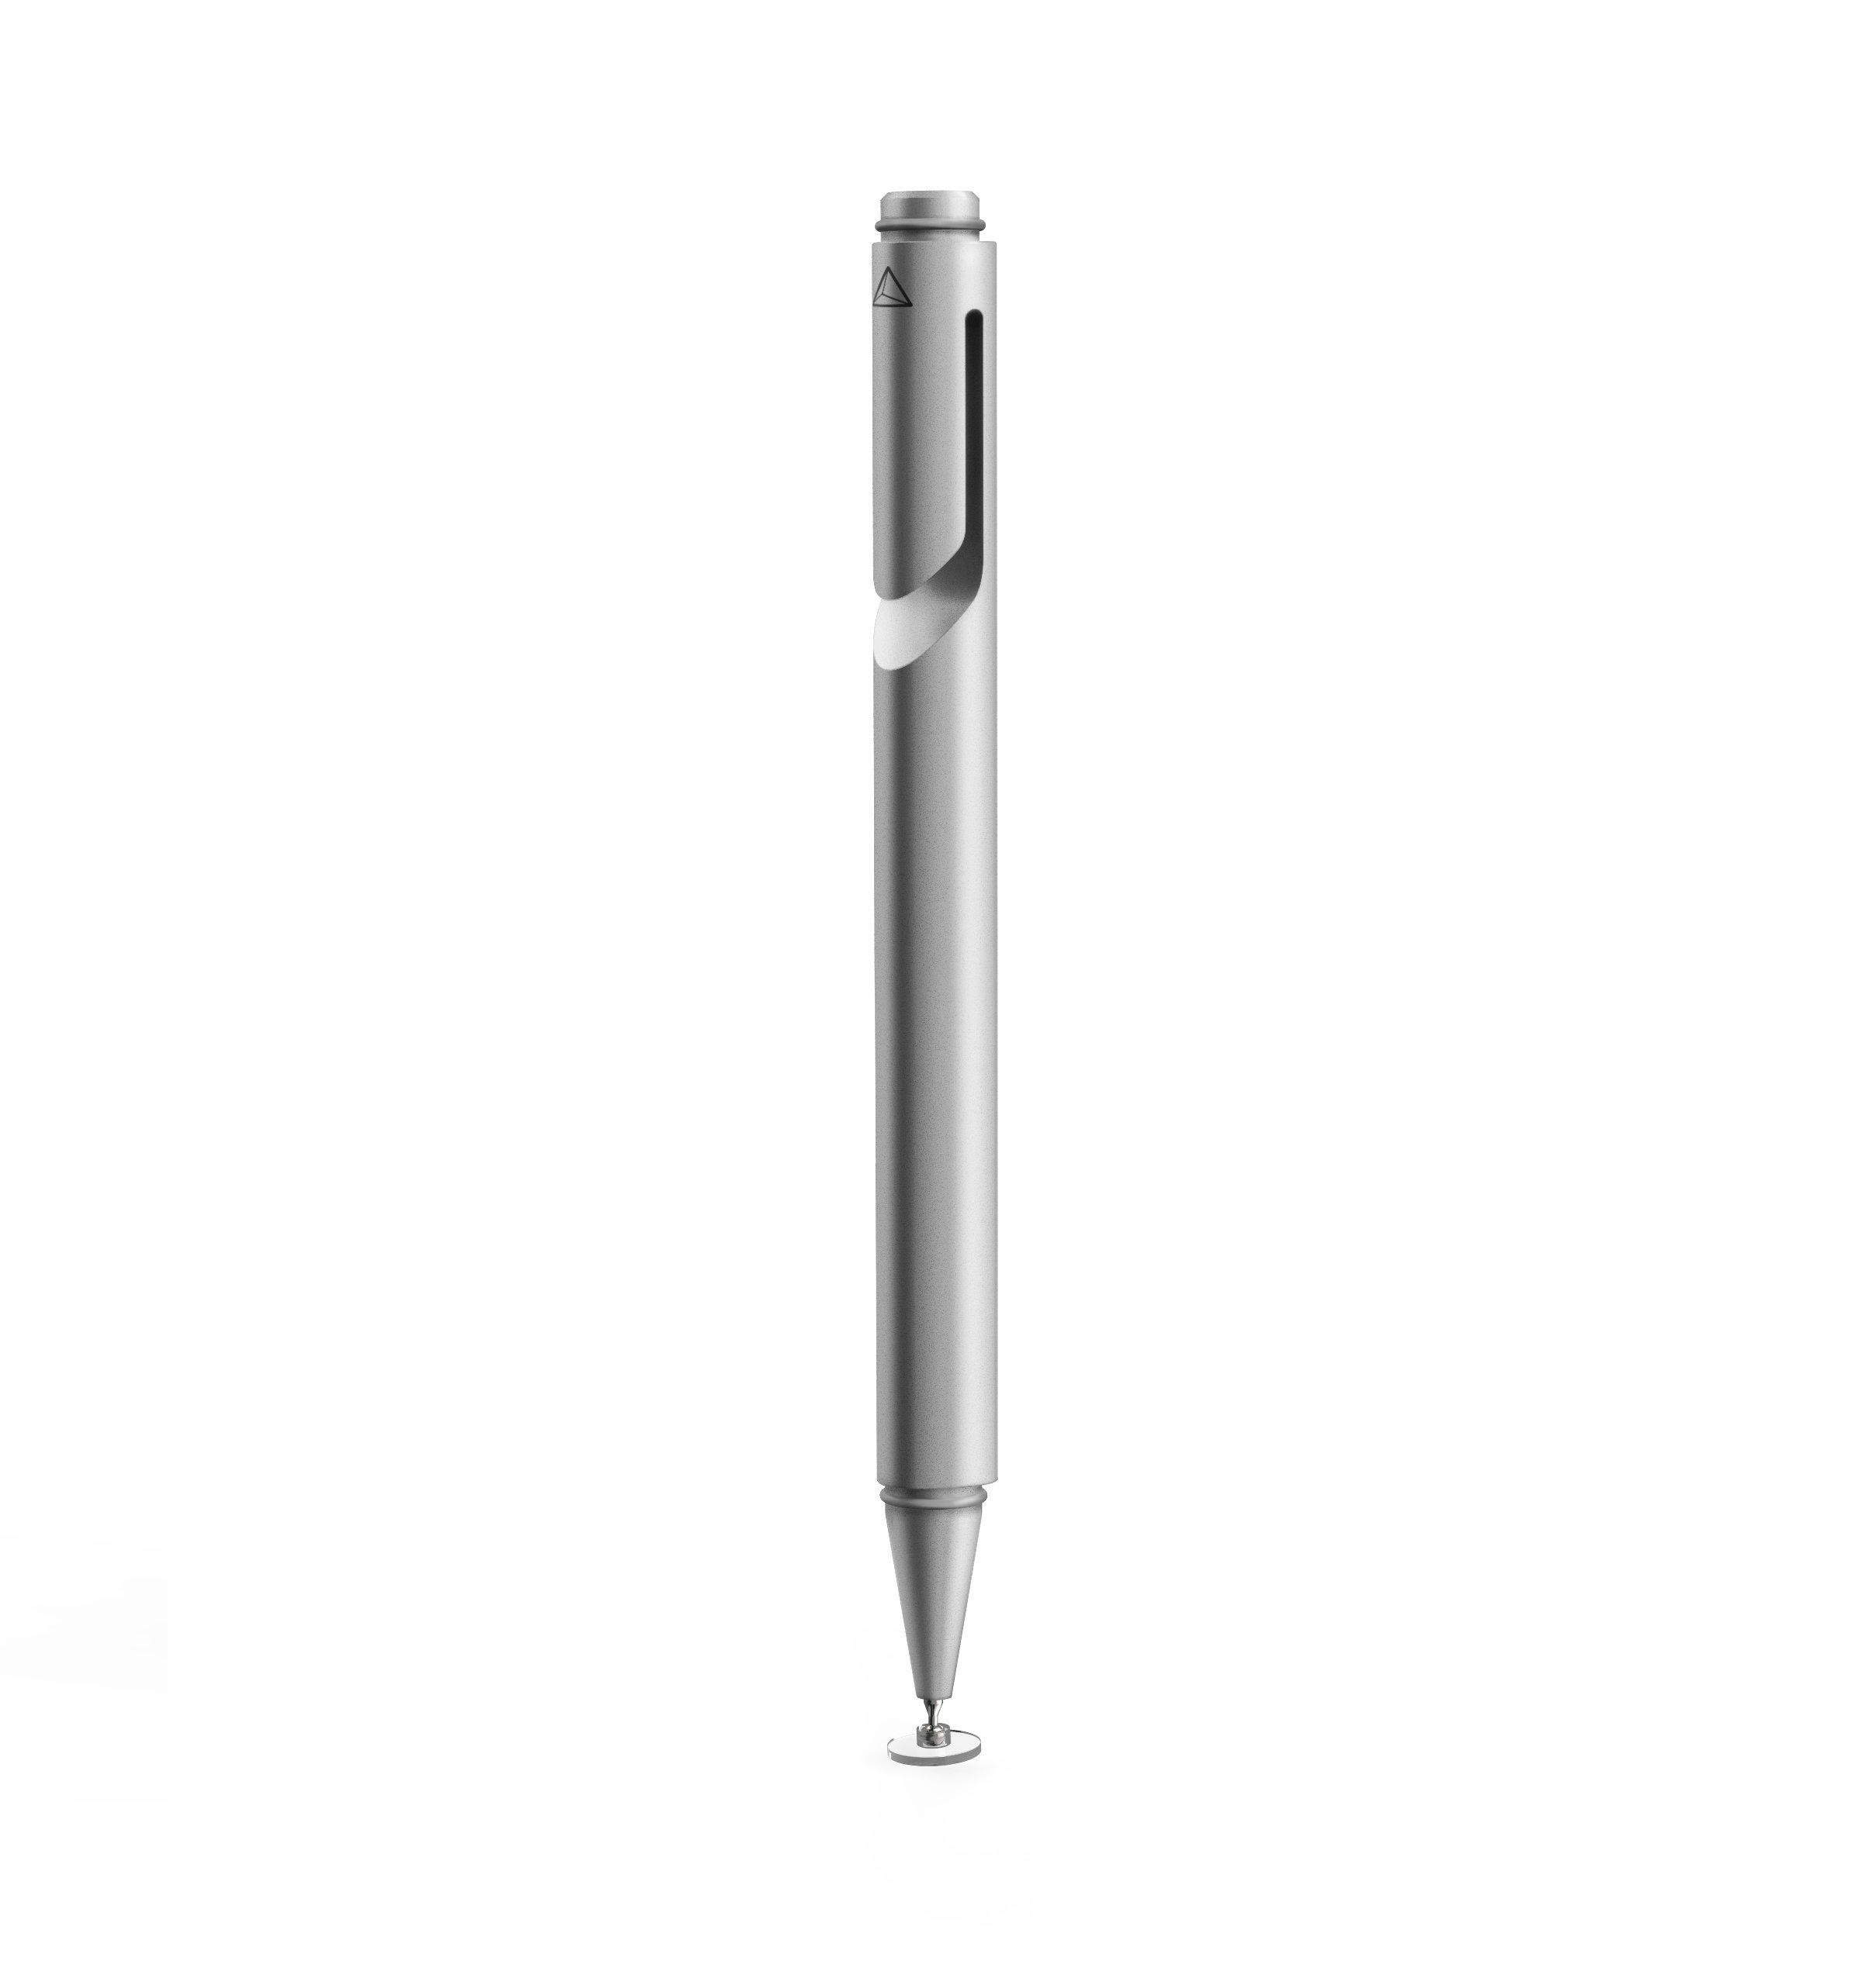 Adonit ADJM3S Mini 3 Fine Point Precision Stylus for Touchscreen Devices, Silver